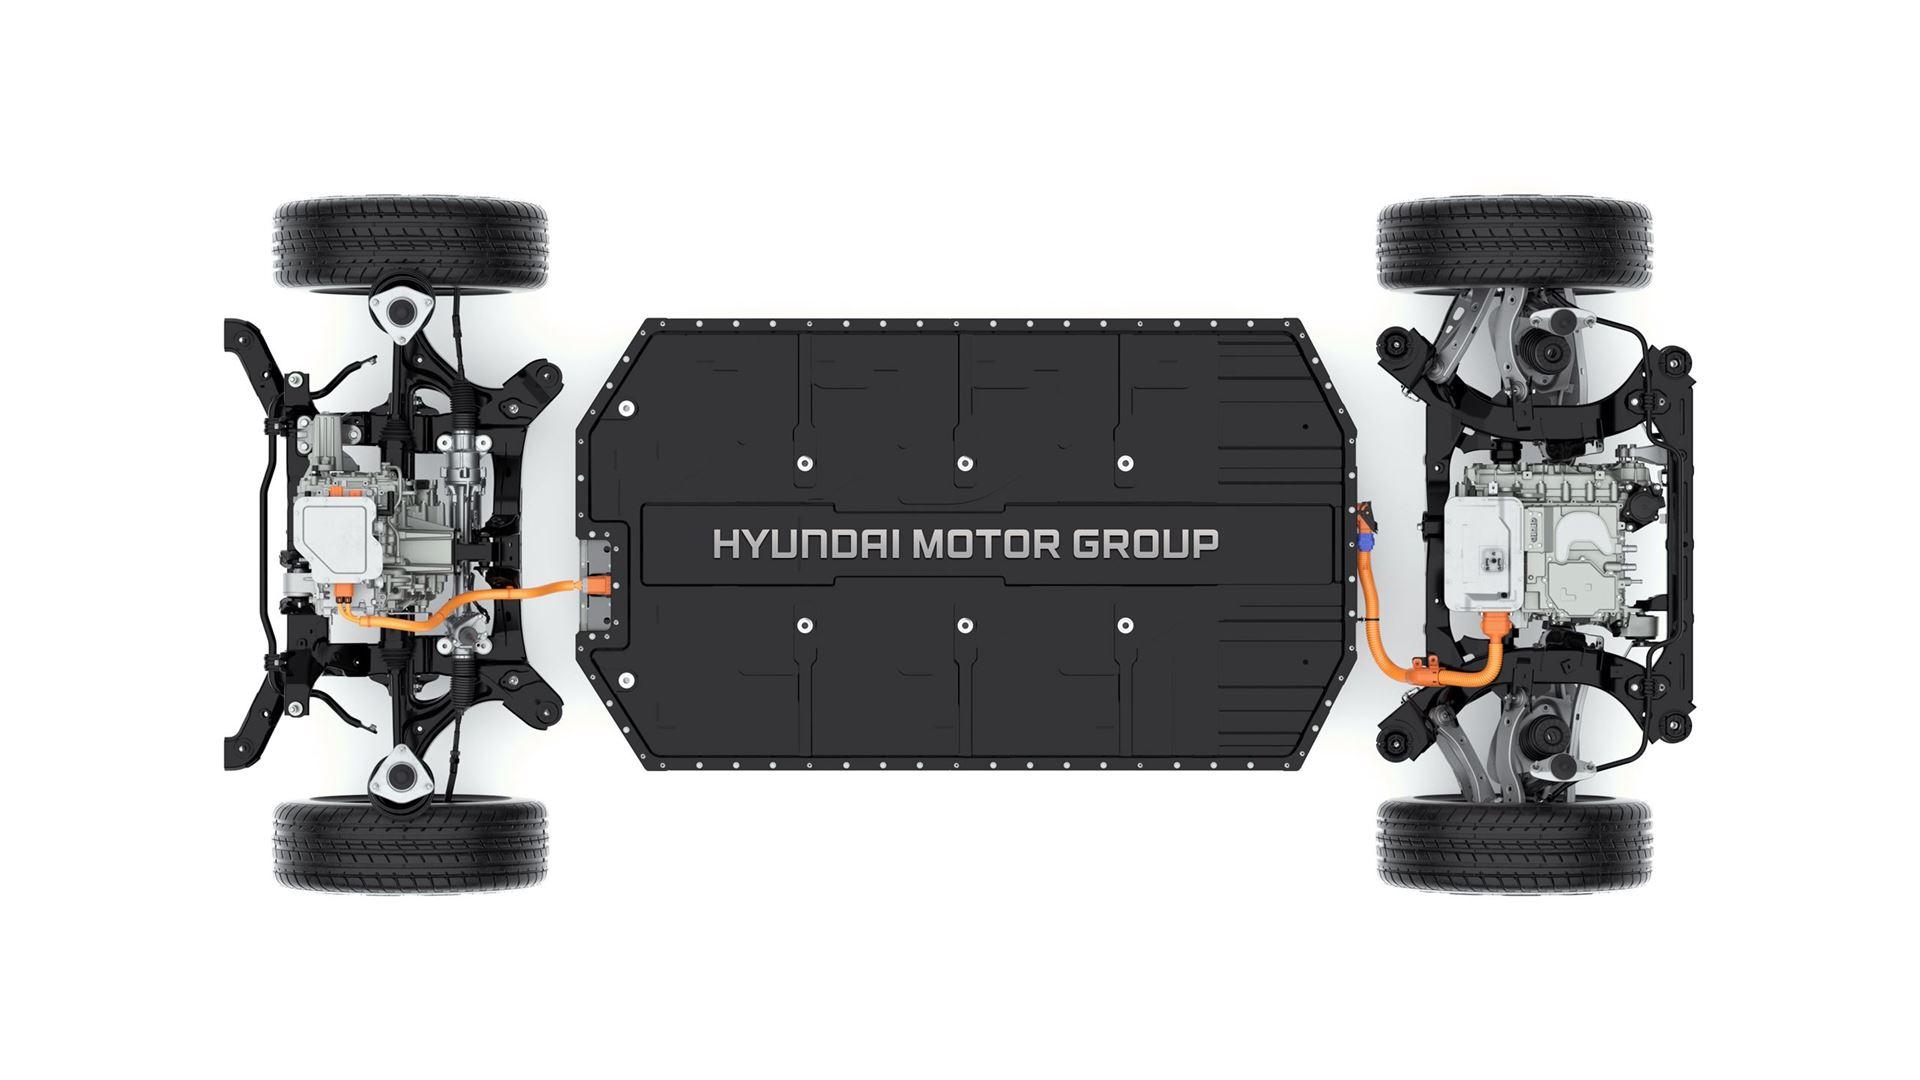 Hyundai Motor Group to Lead Charge into Electric Era with Dedicated EV Platform 'E-GMP' - Image 7